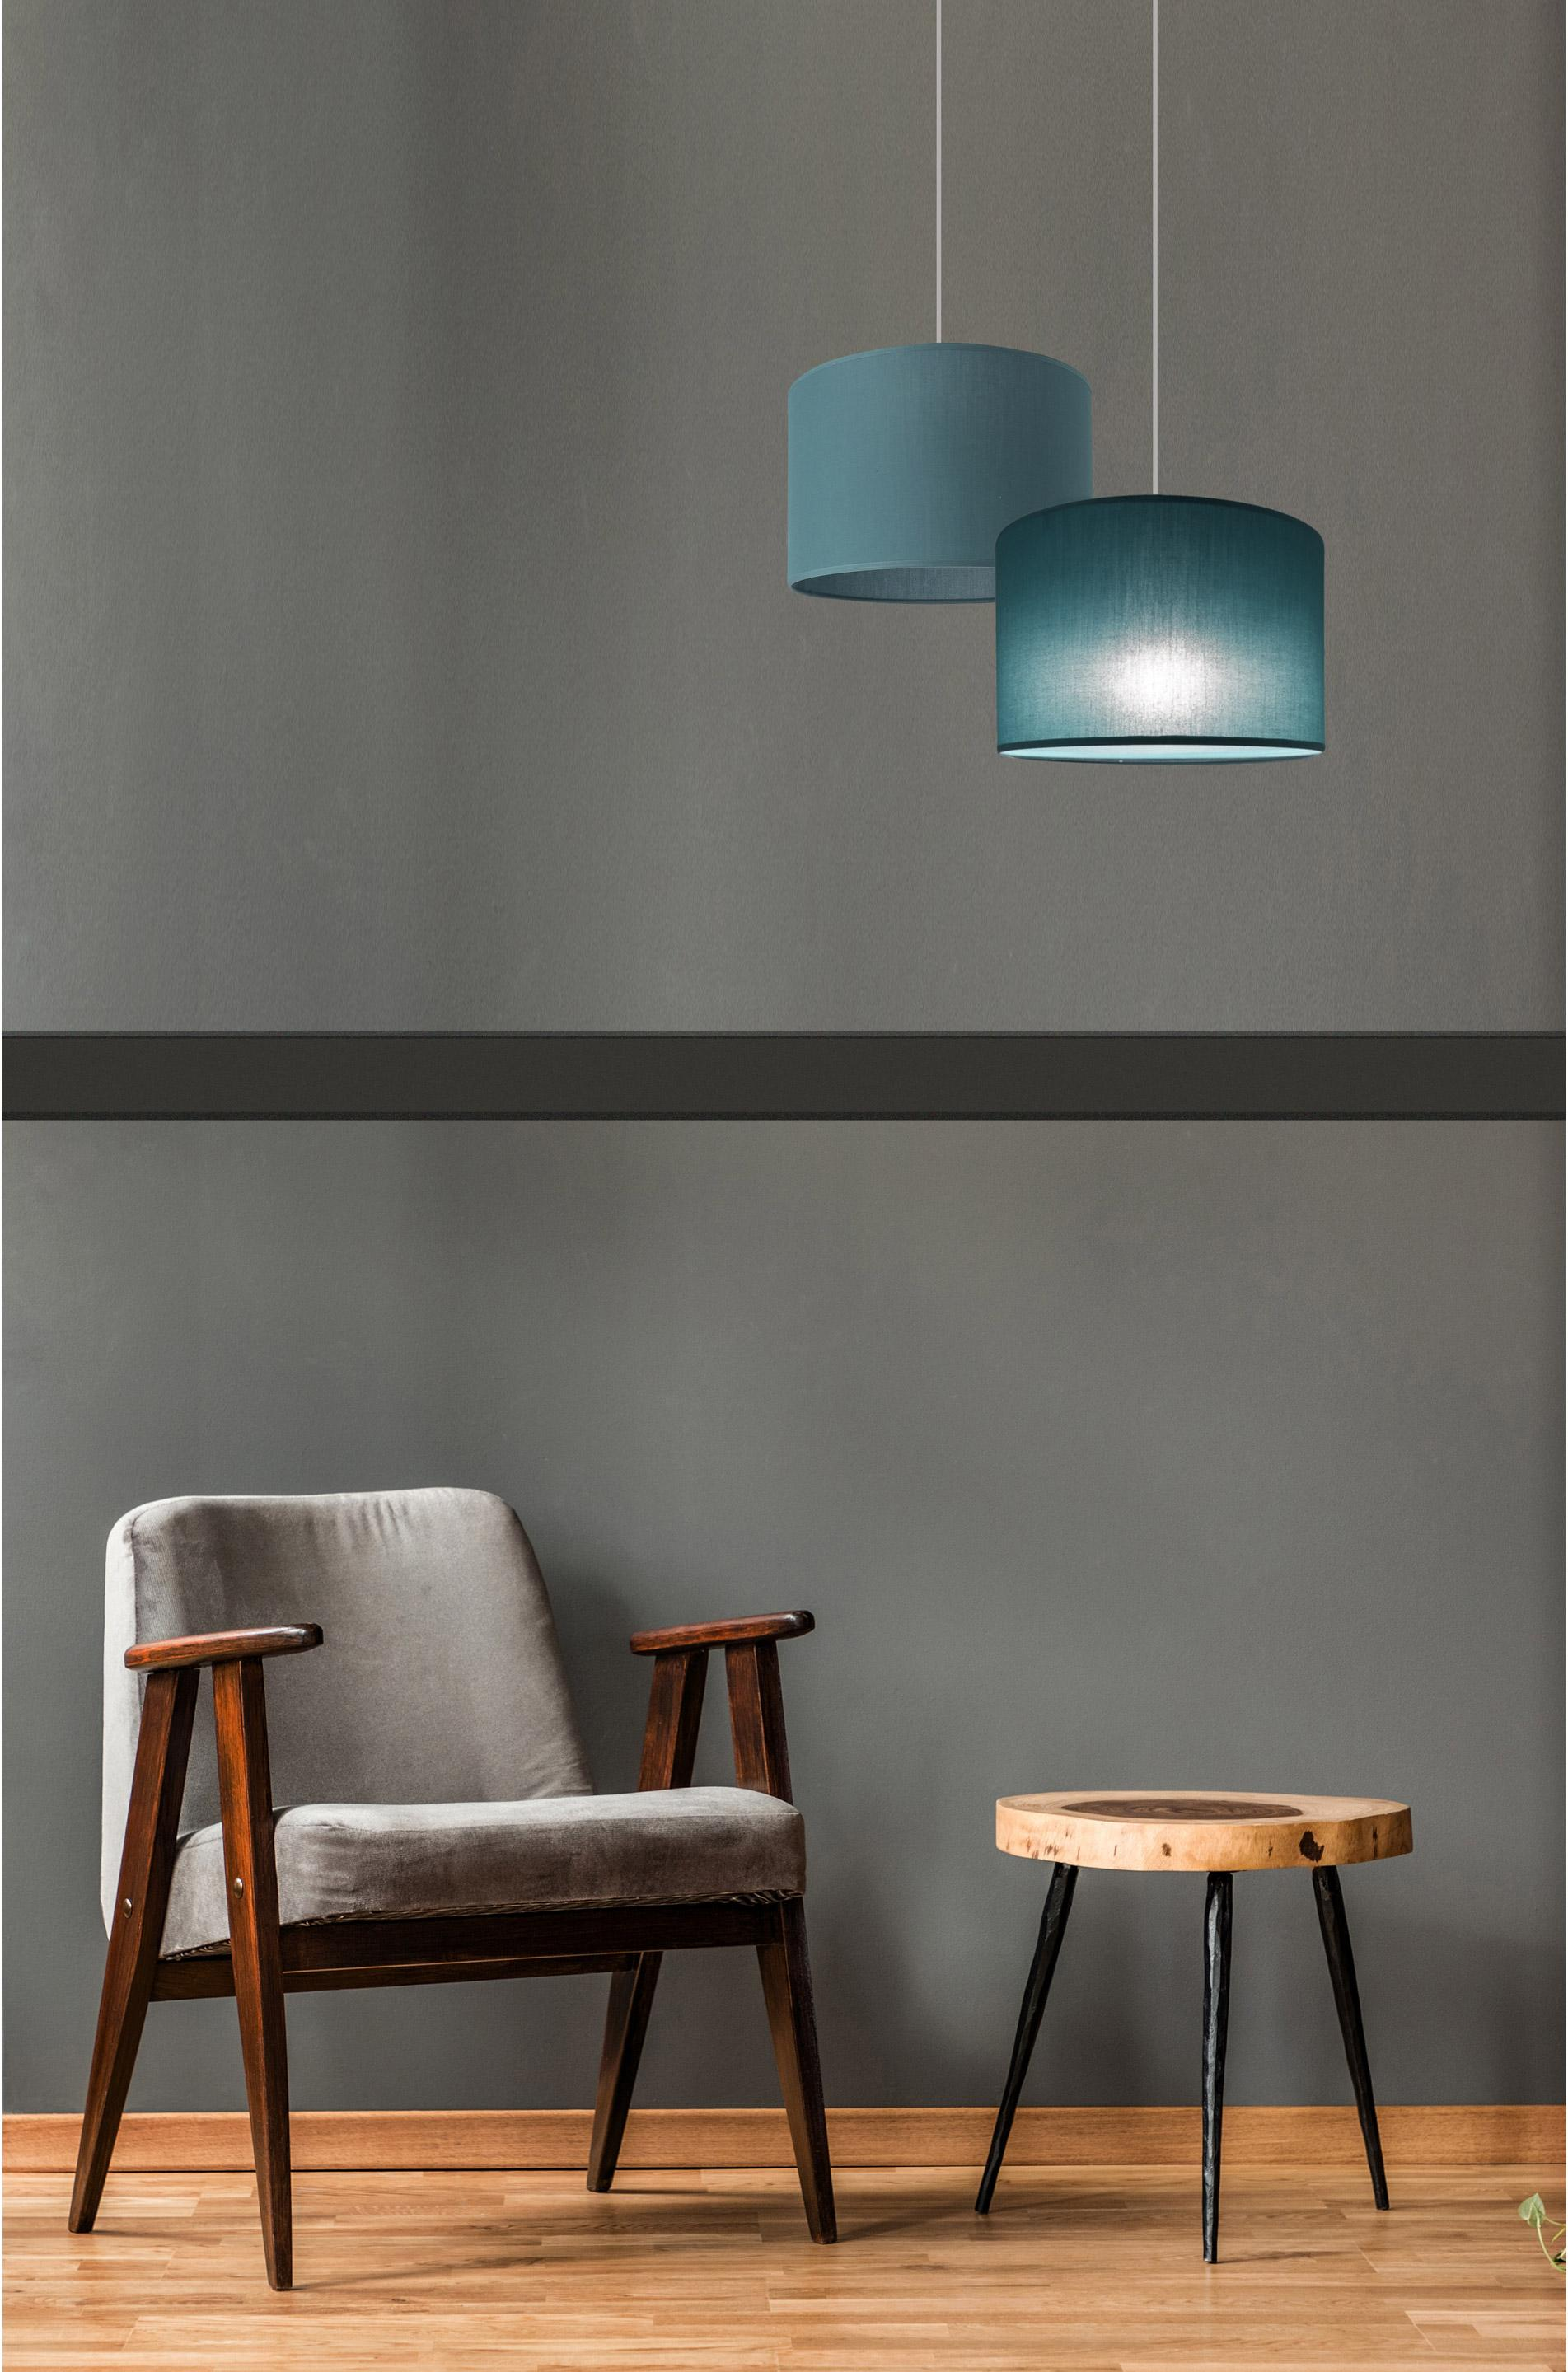 Suspension, tropical, coton bleu canard METROPOLIGHT Natt 1 lumière(s) D.29 cm